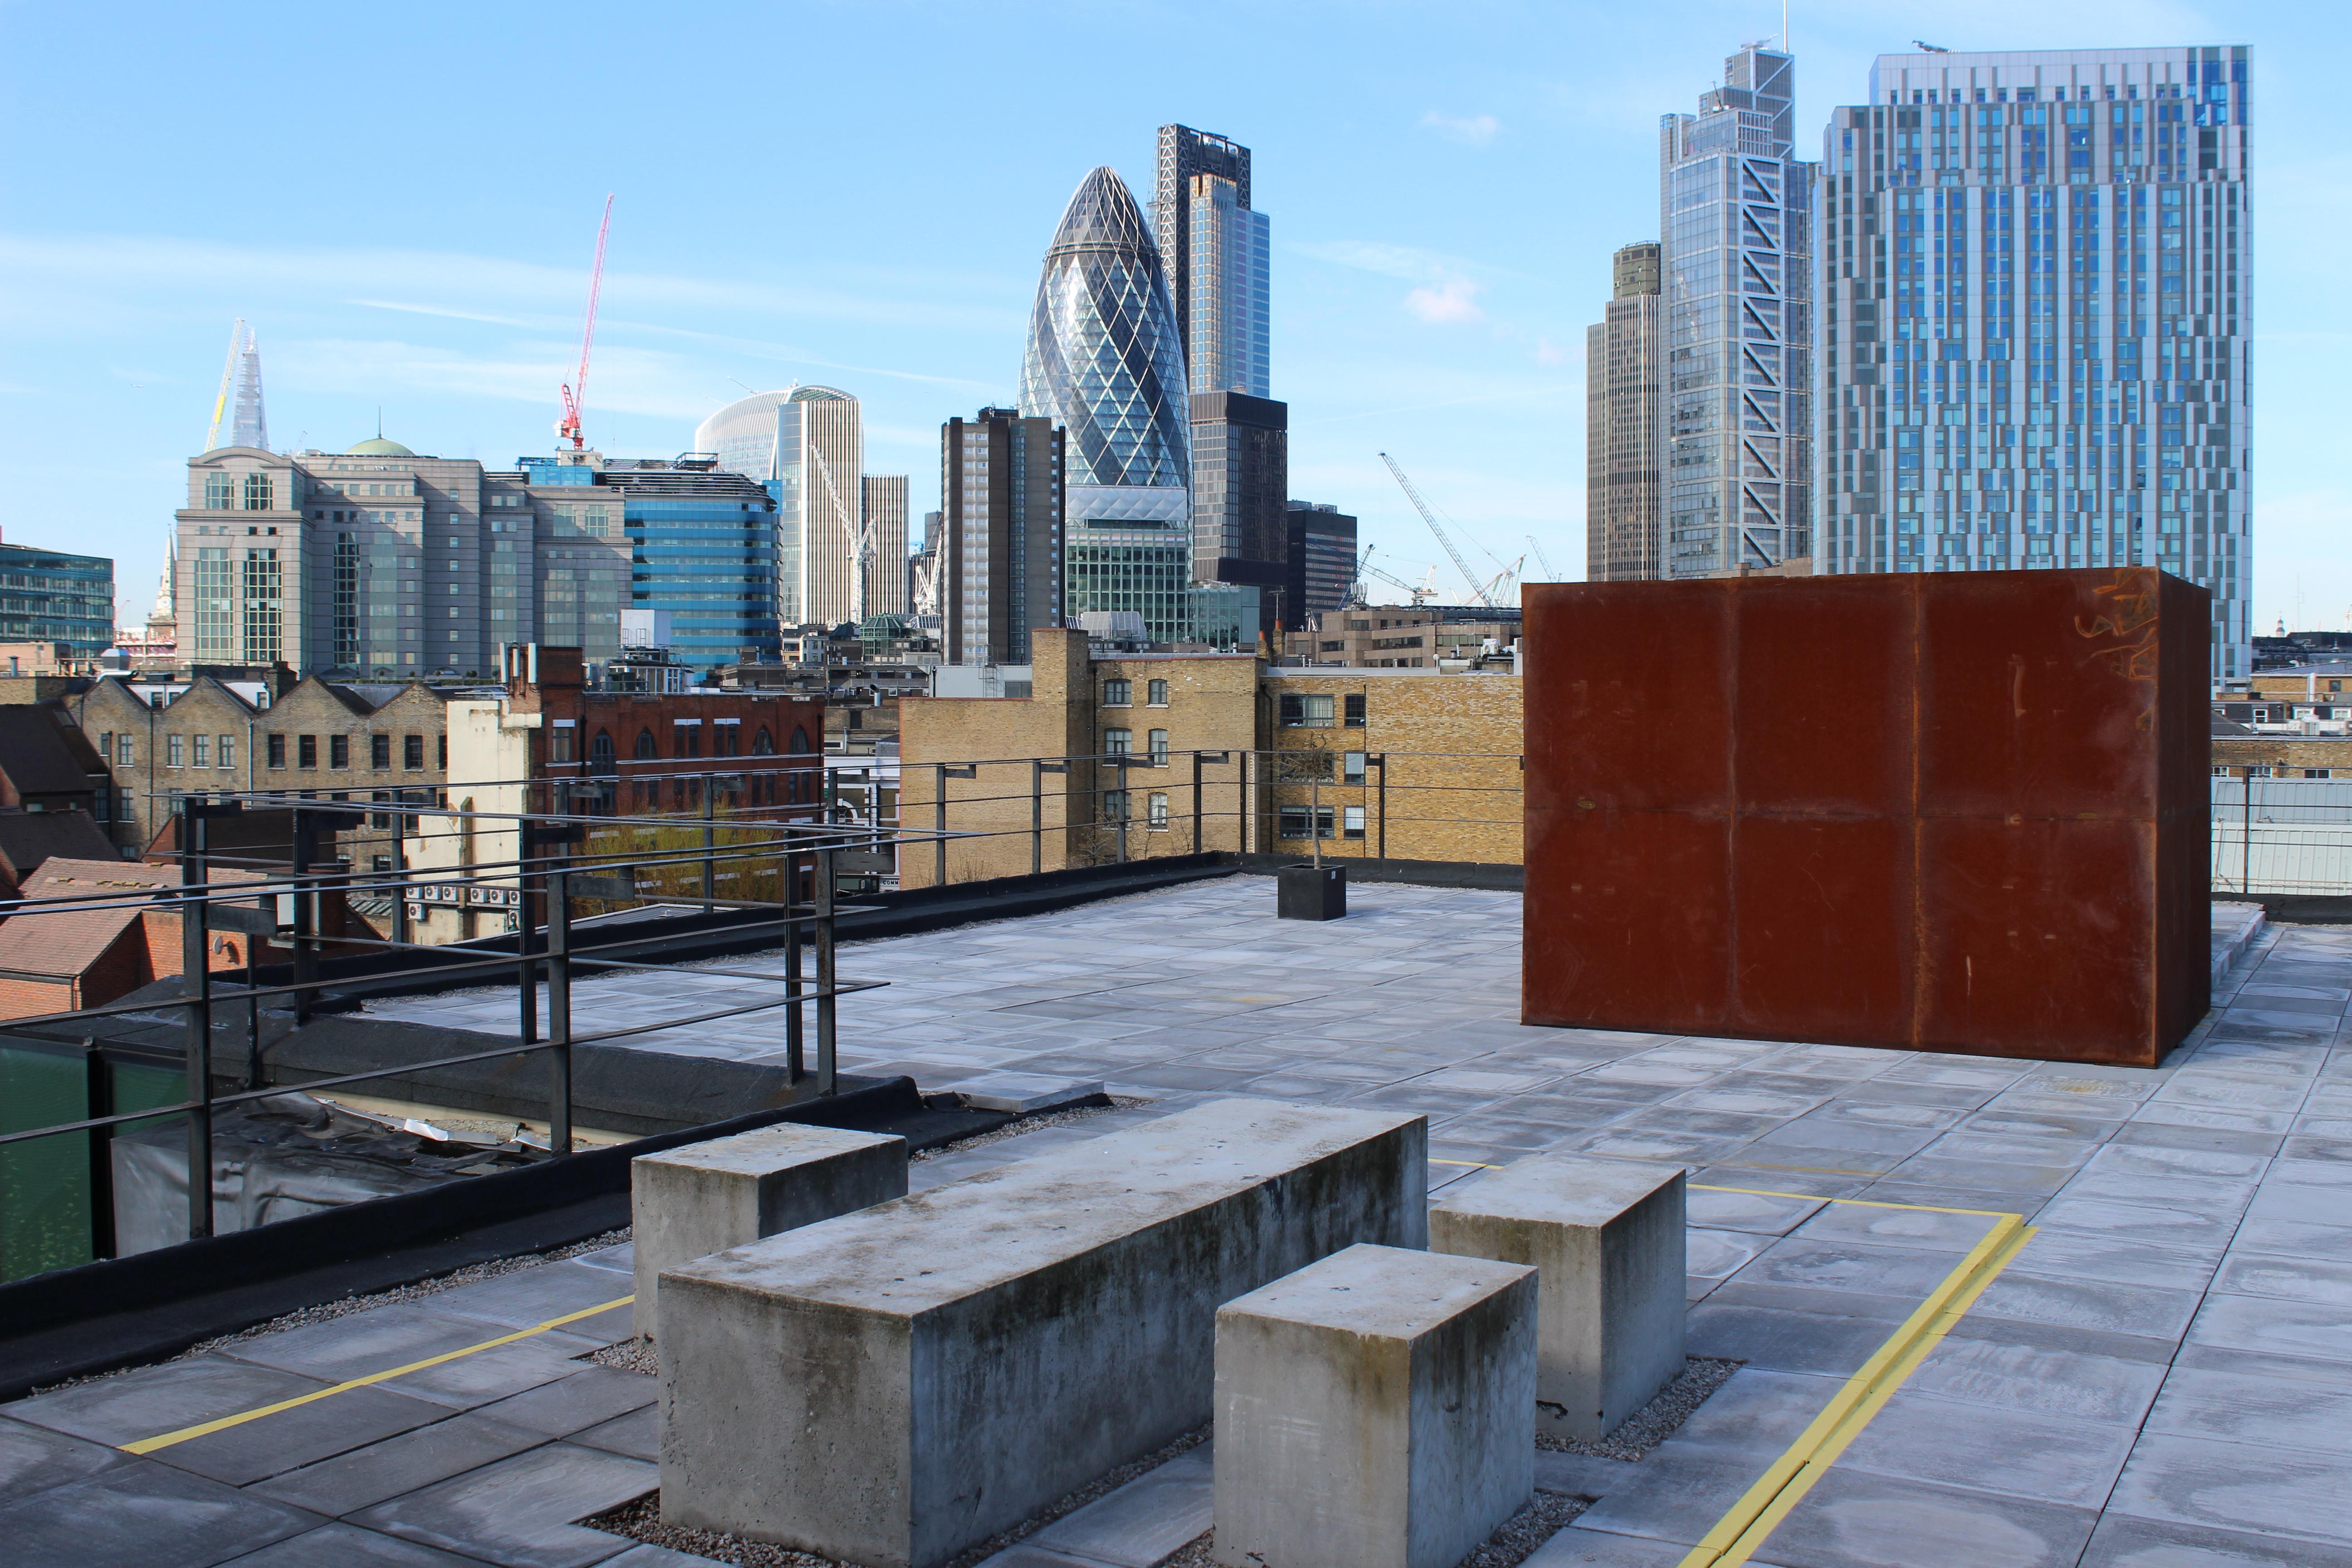 Gcu London News Gcu London Roof Terrace Reopens